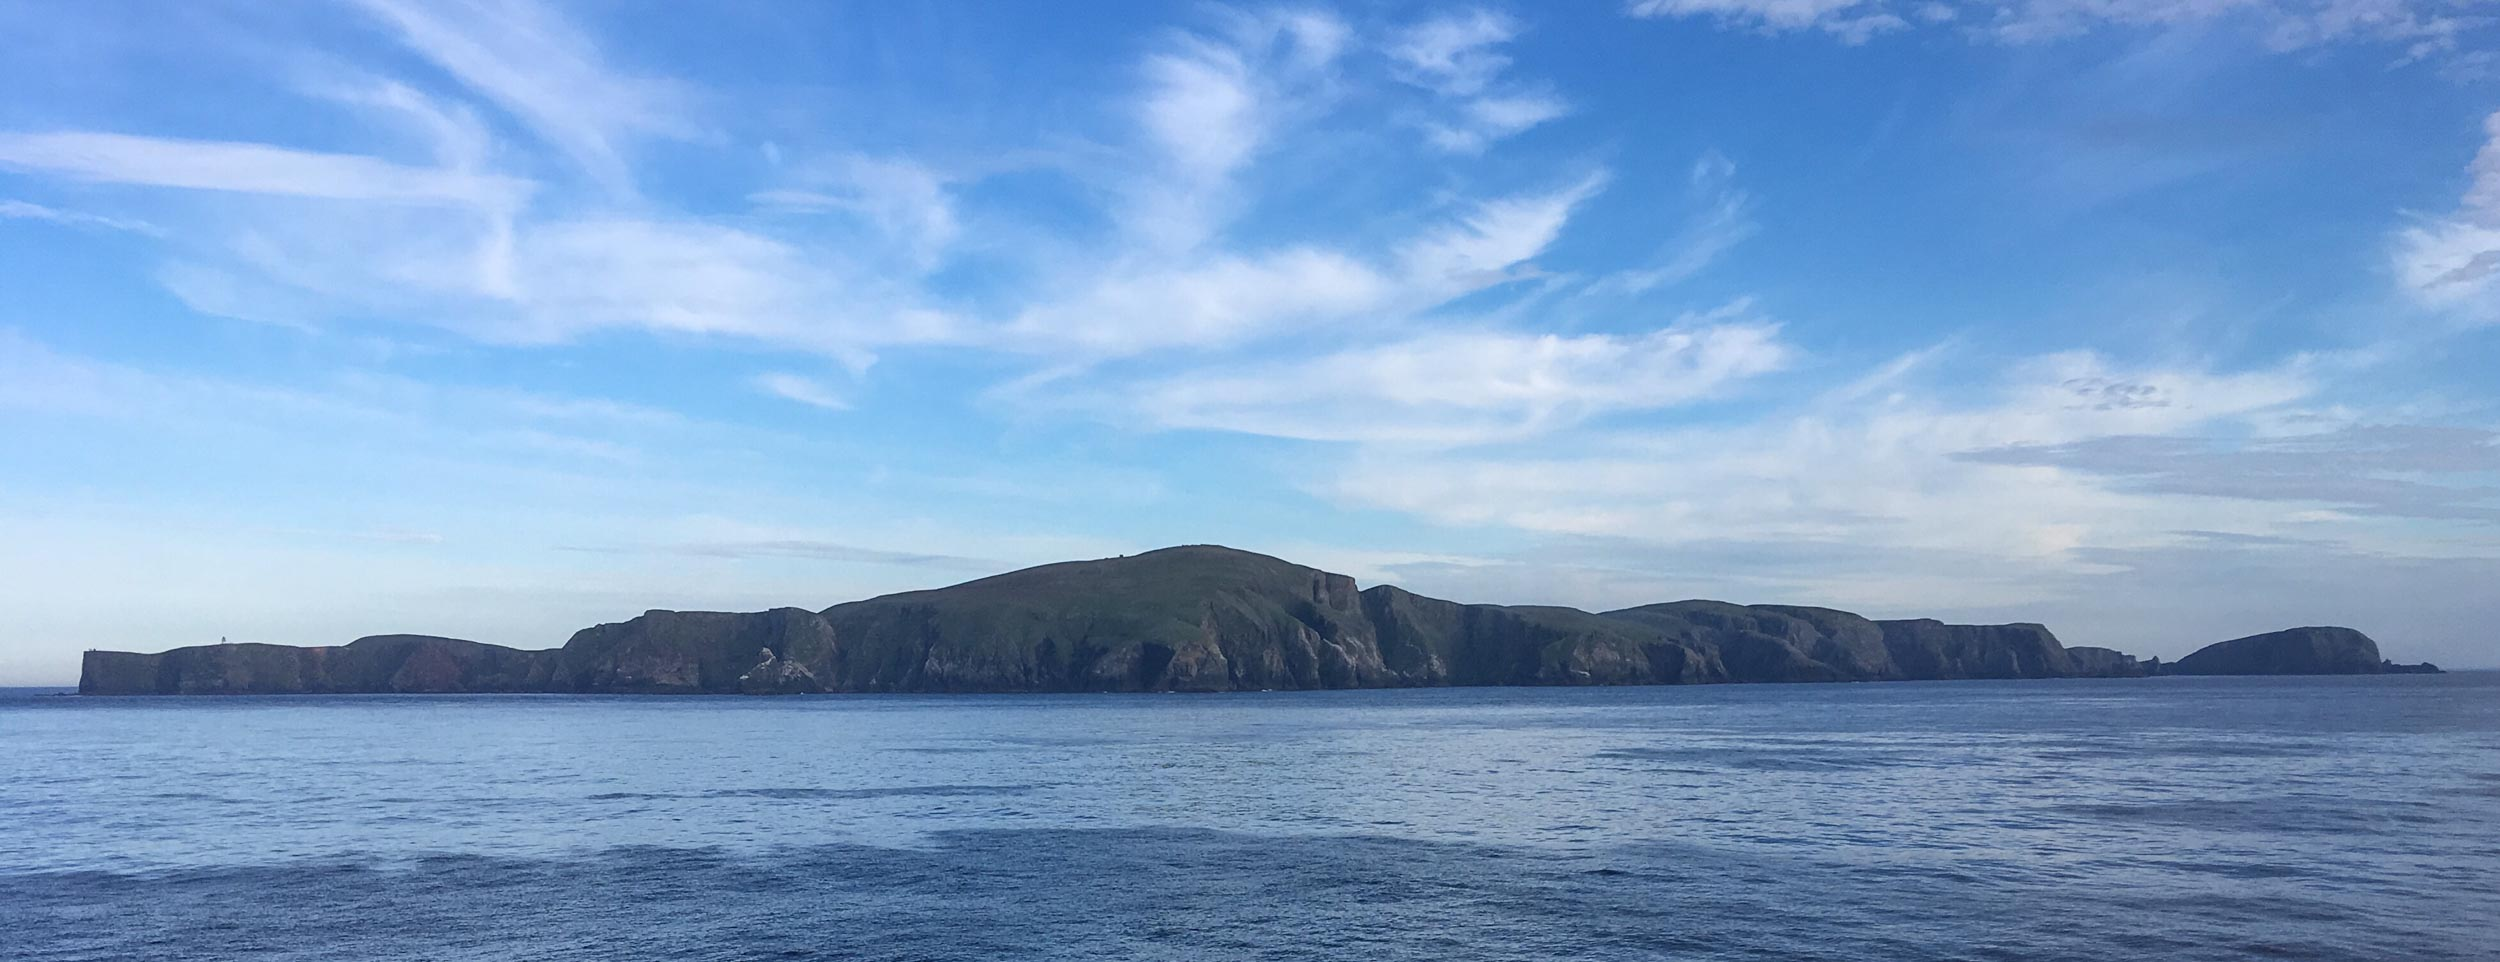 FAIR ISLE, the northern coast